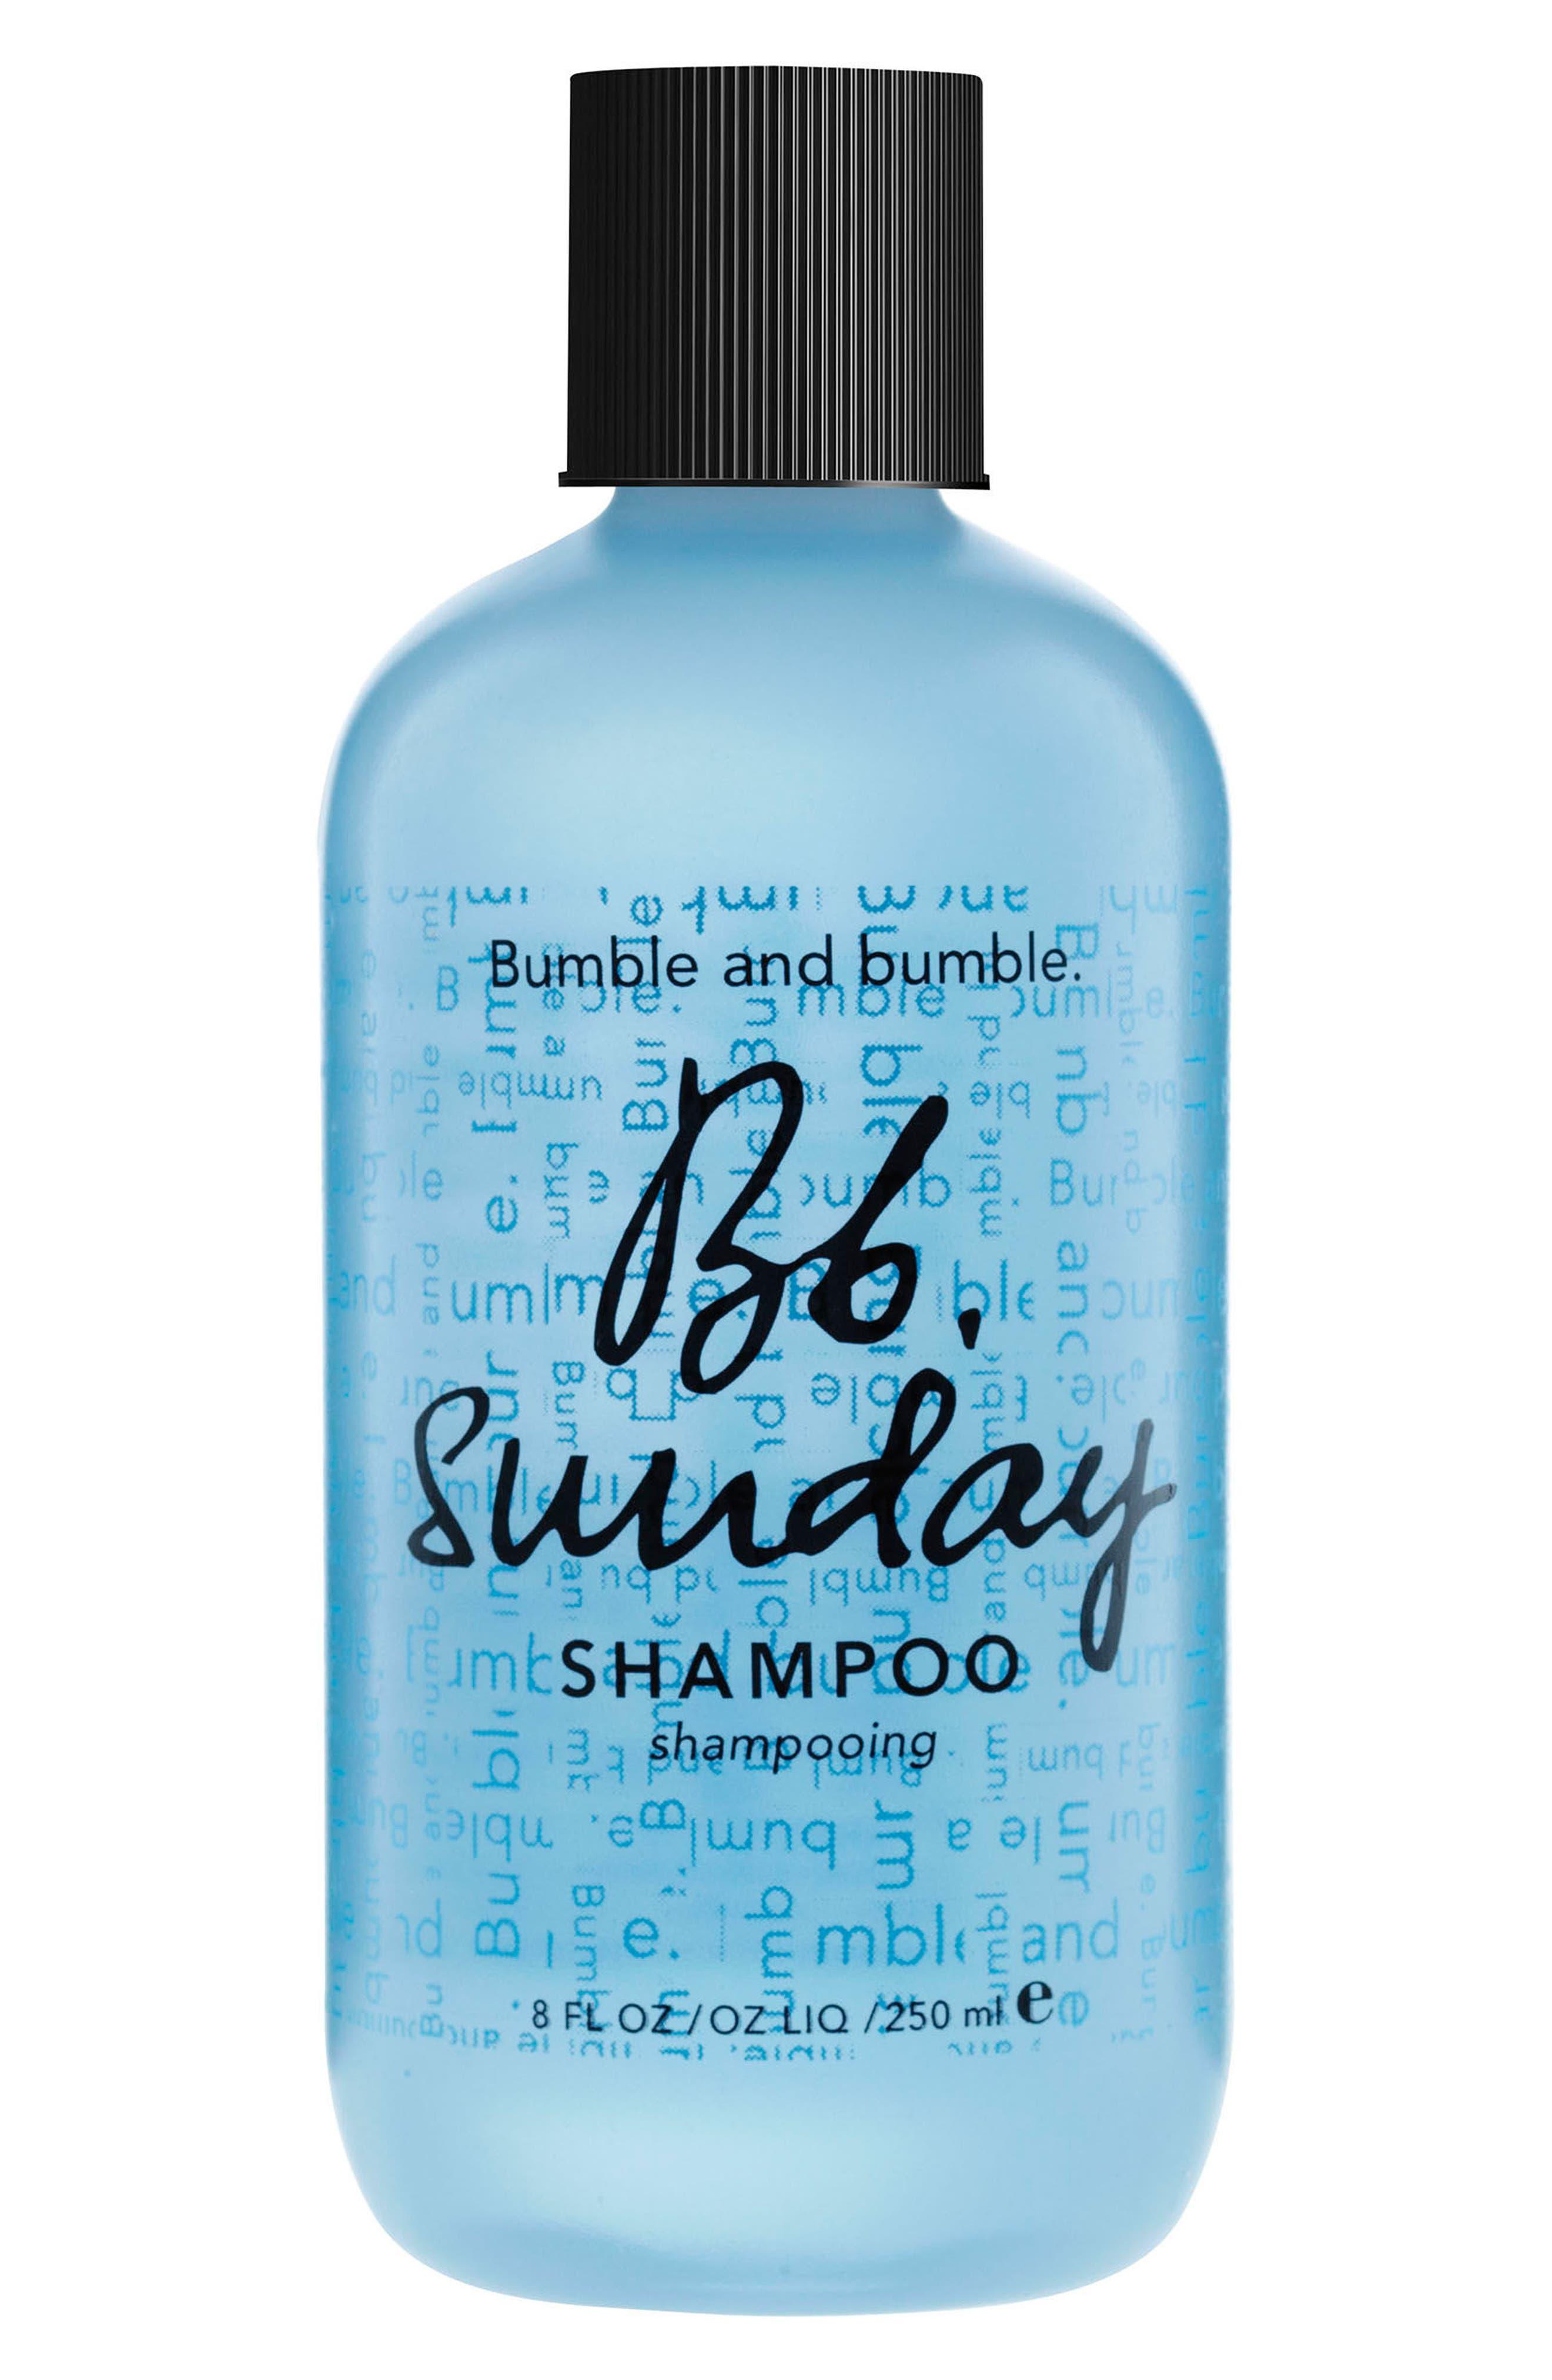 Alternate Image 1 Selected - Bumble and bumble Sunday Shampoo